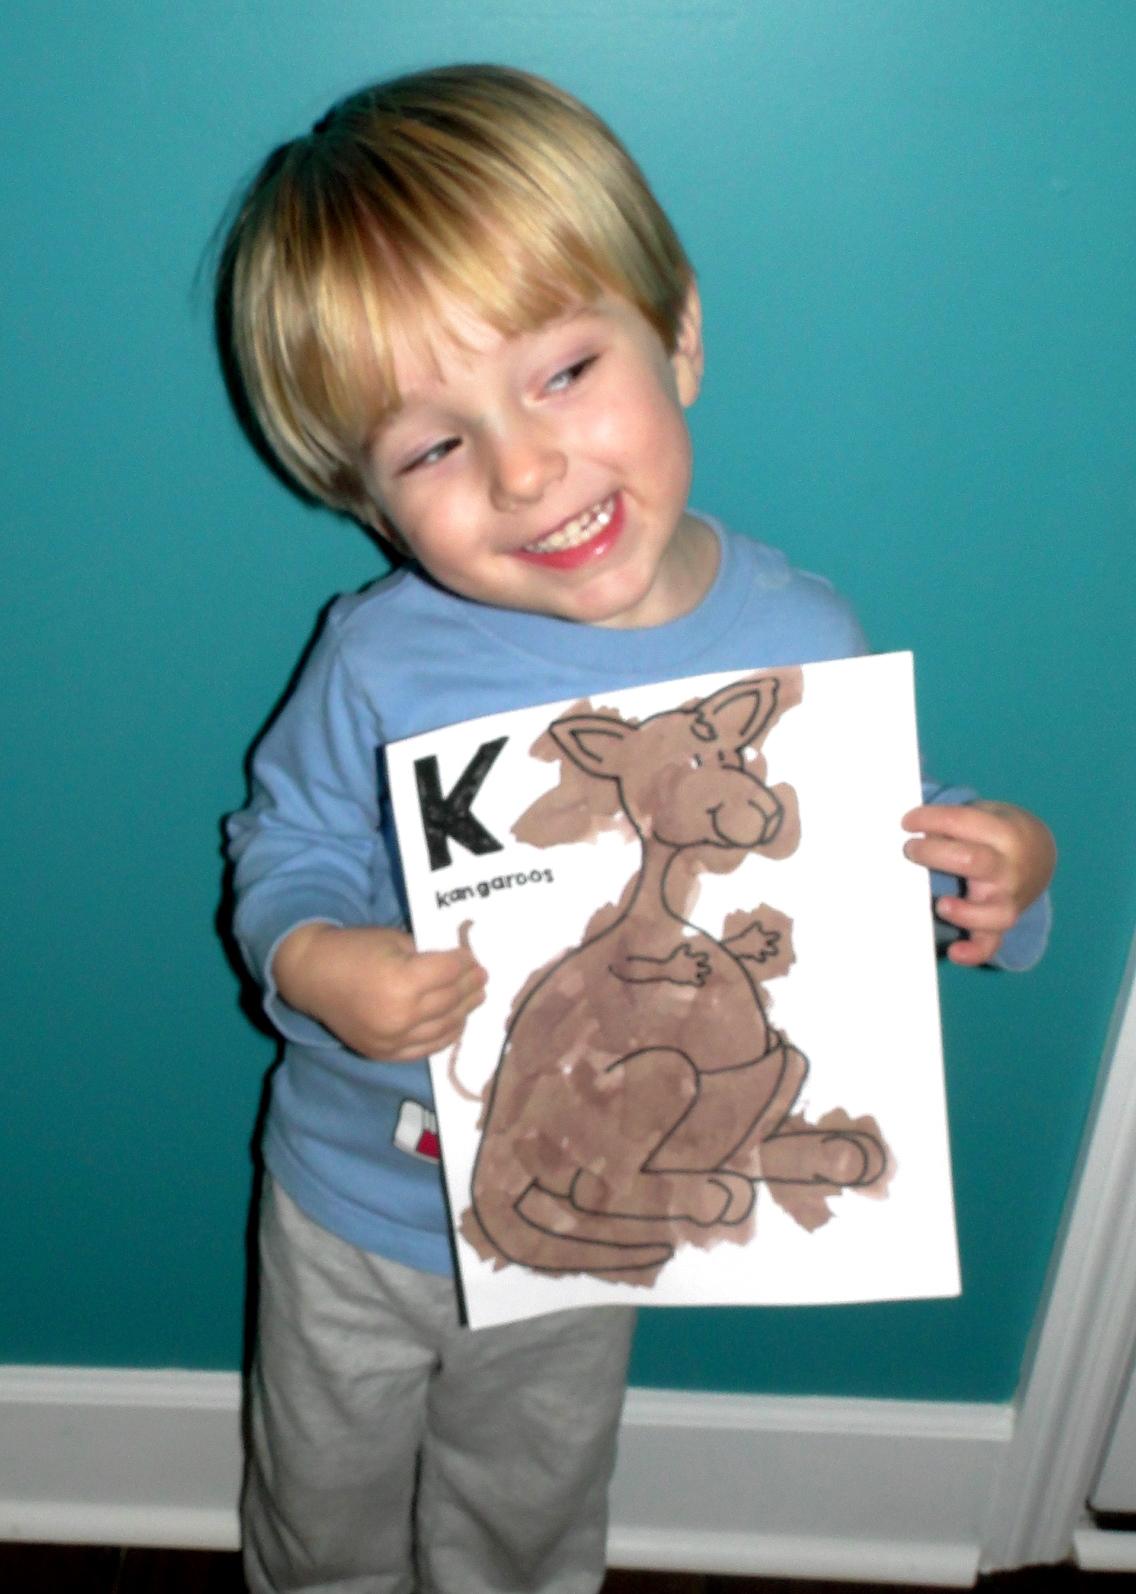 Kye Artwork and Progress Report ~ Spring 2012